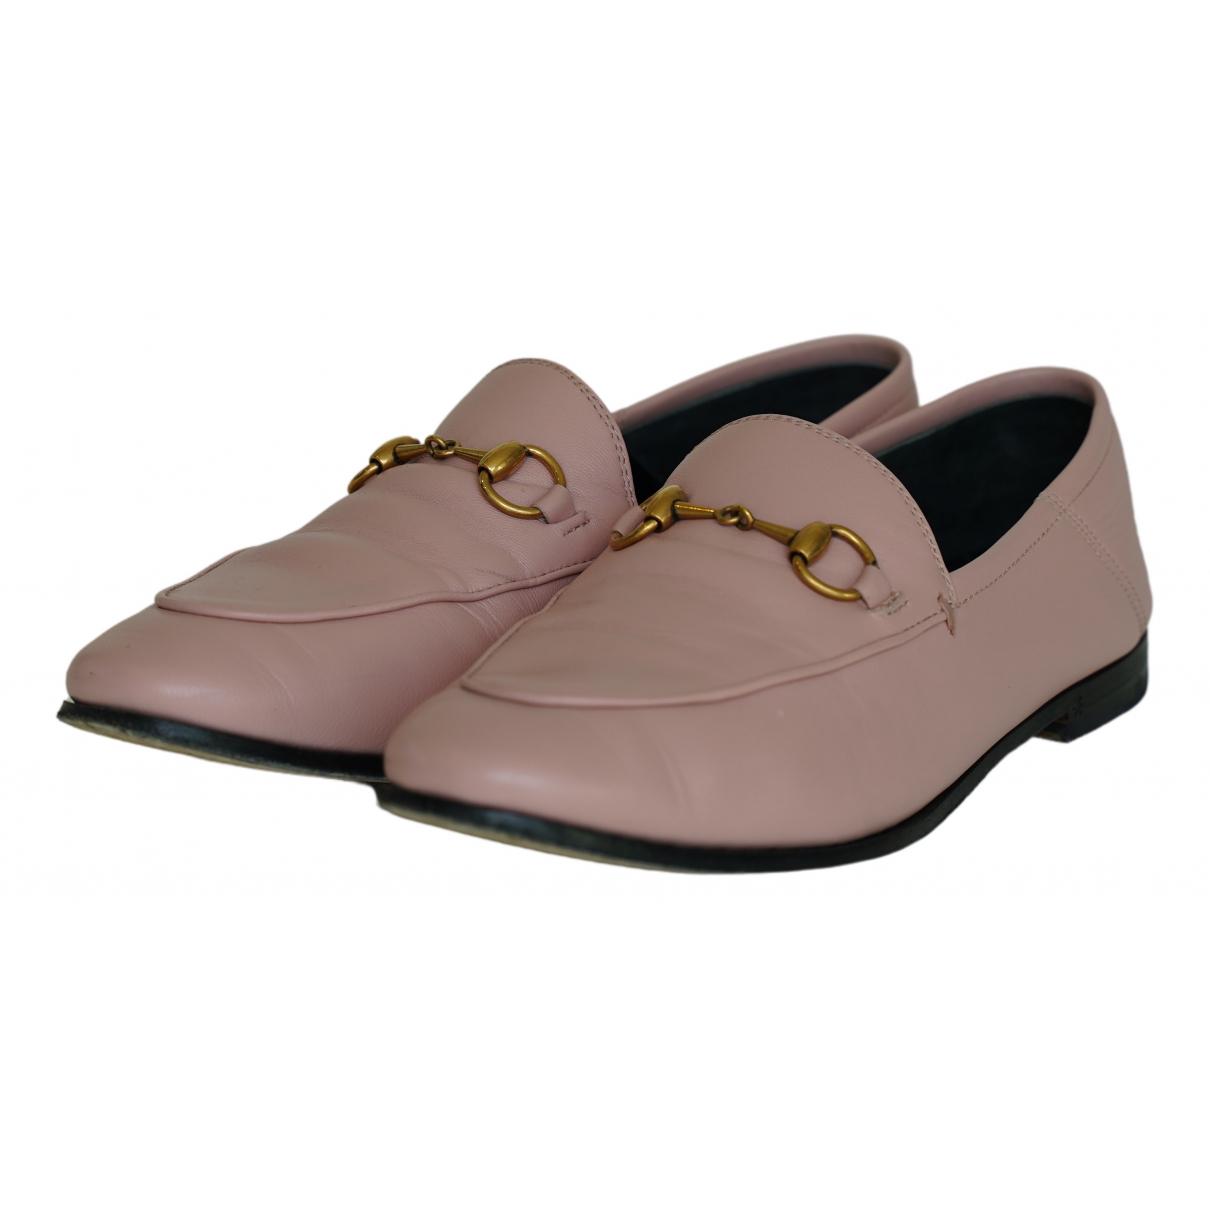 Gucci Jordaan Pink Leather Flats for Women 36.5 EU